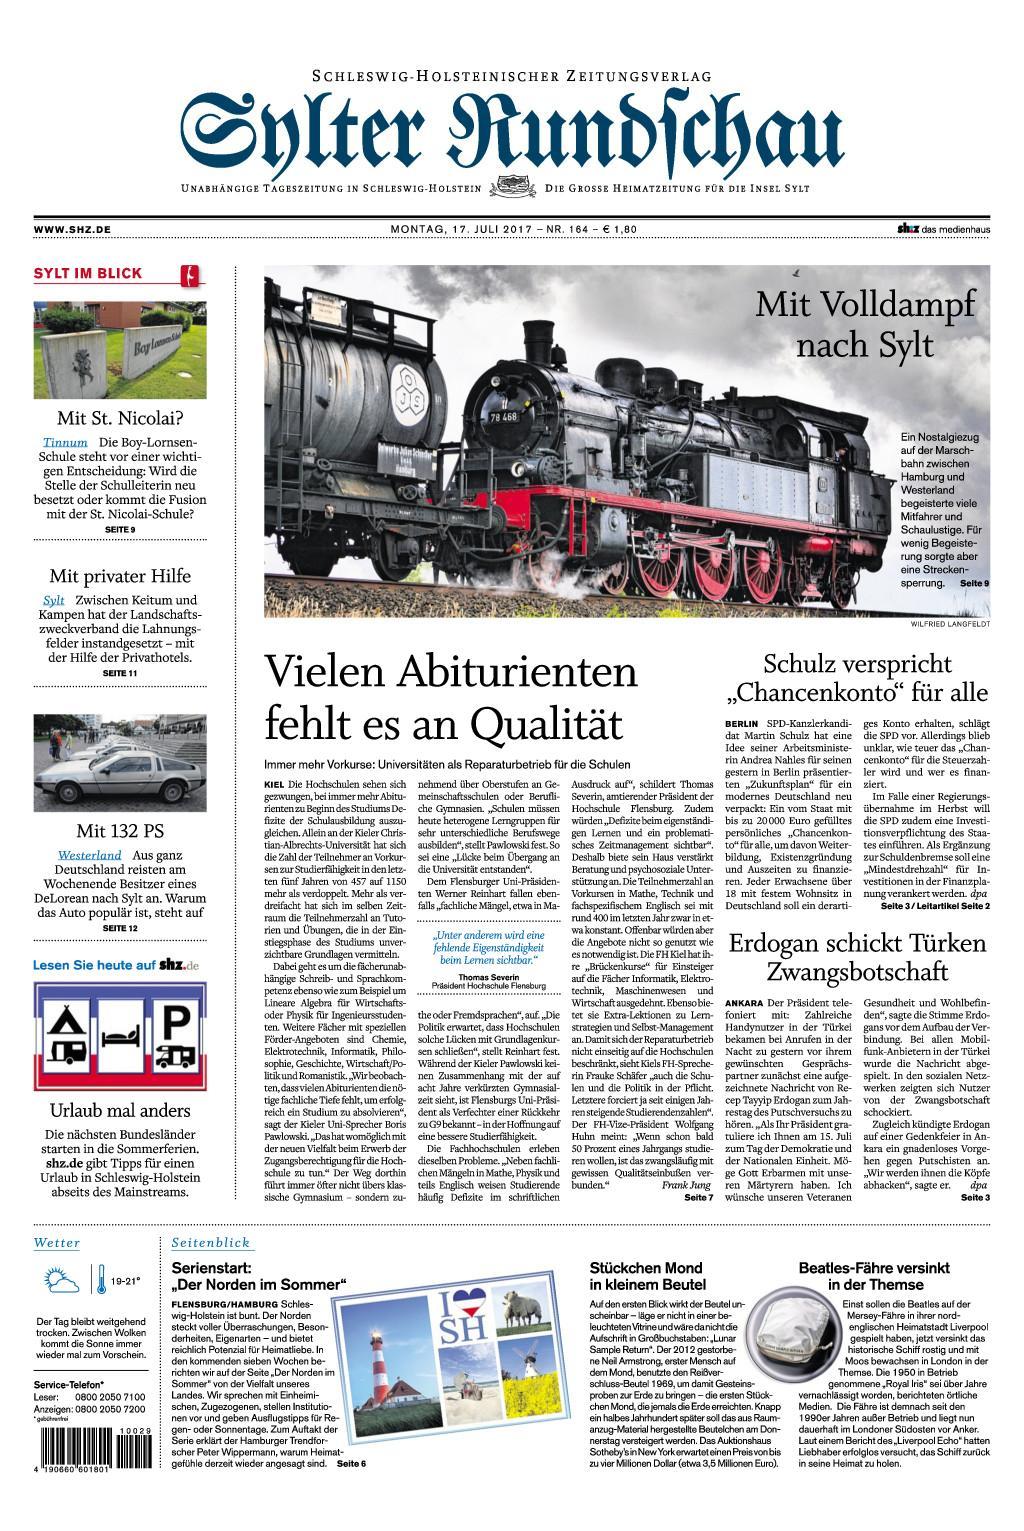 : Sylter Rundschau 17 Juli 2017